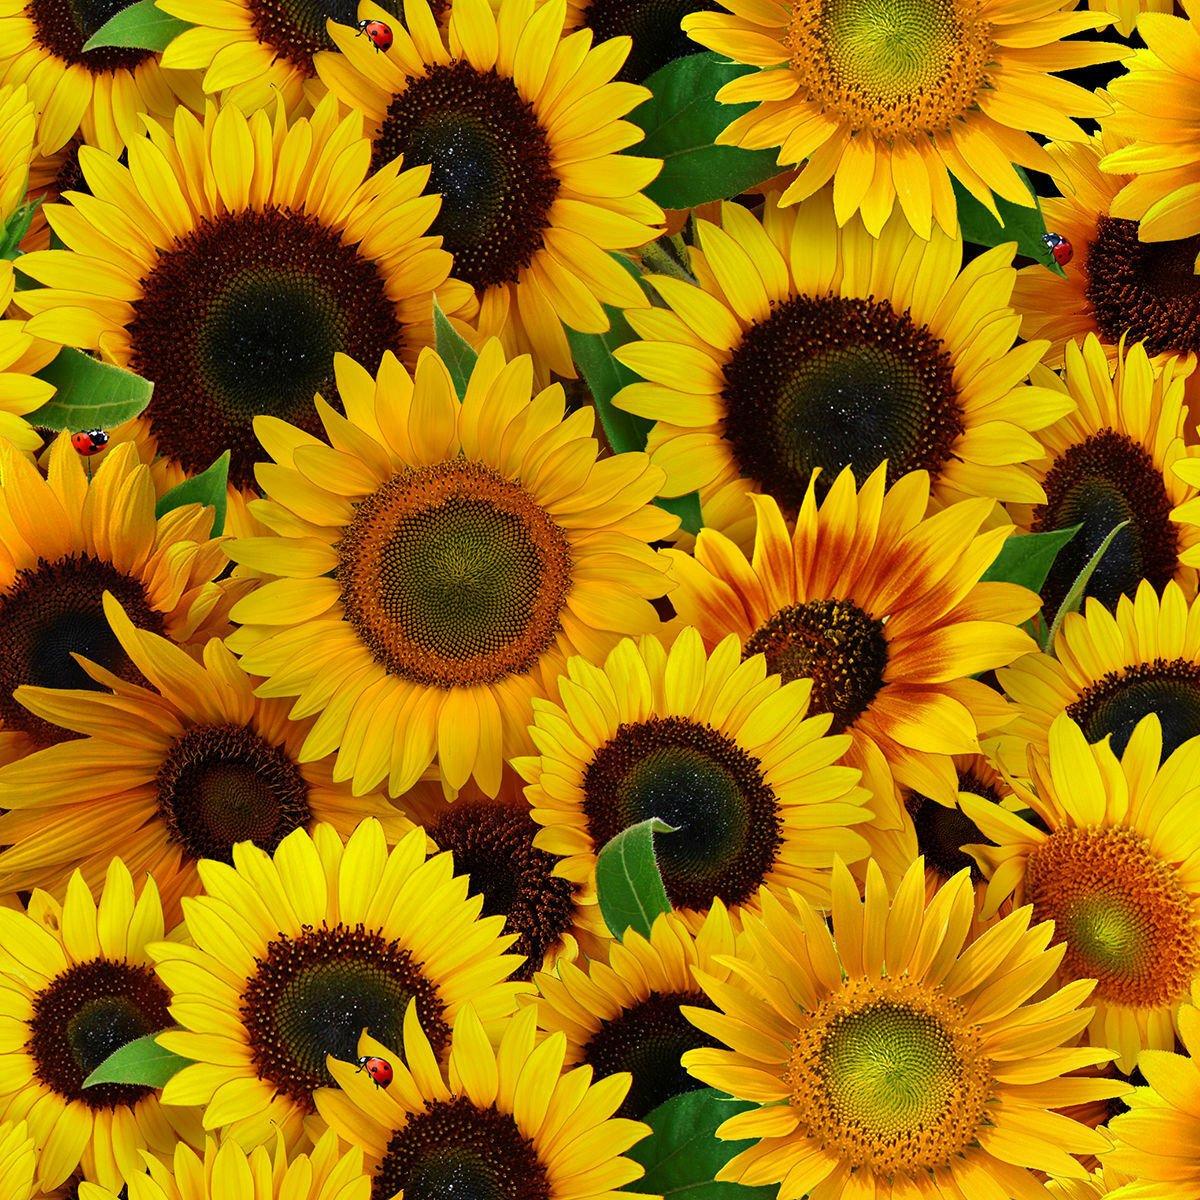 ES 487 Sunflowers